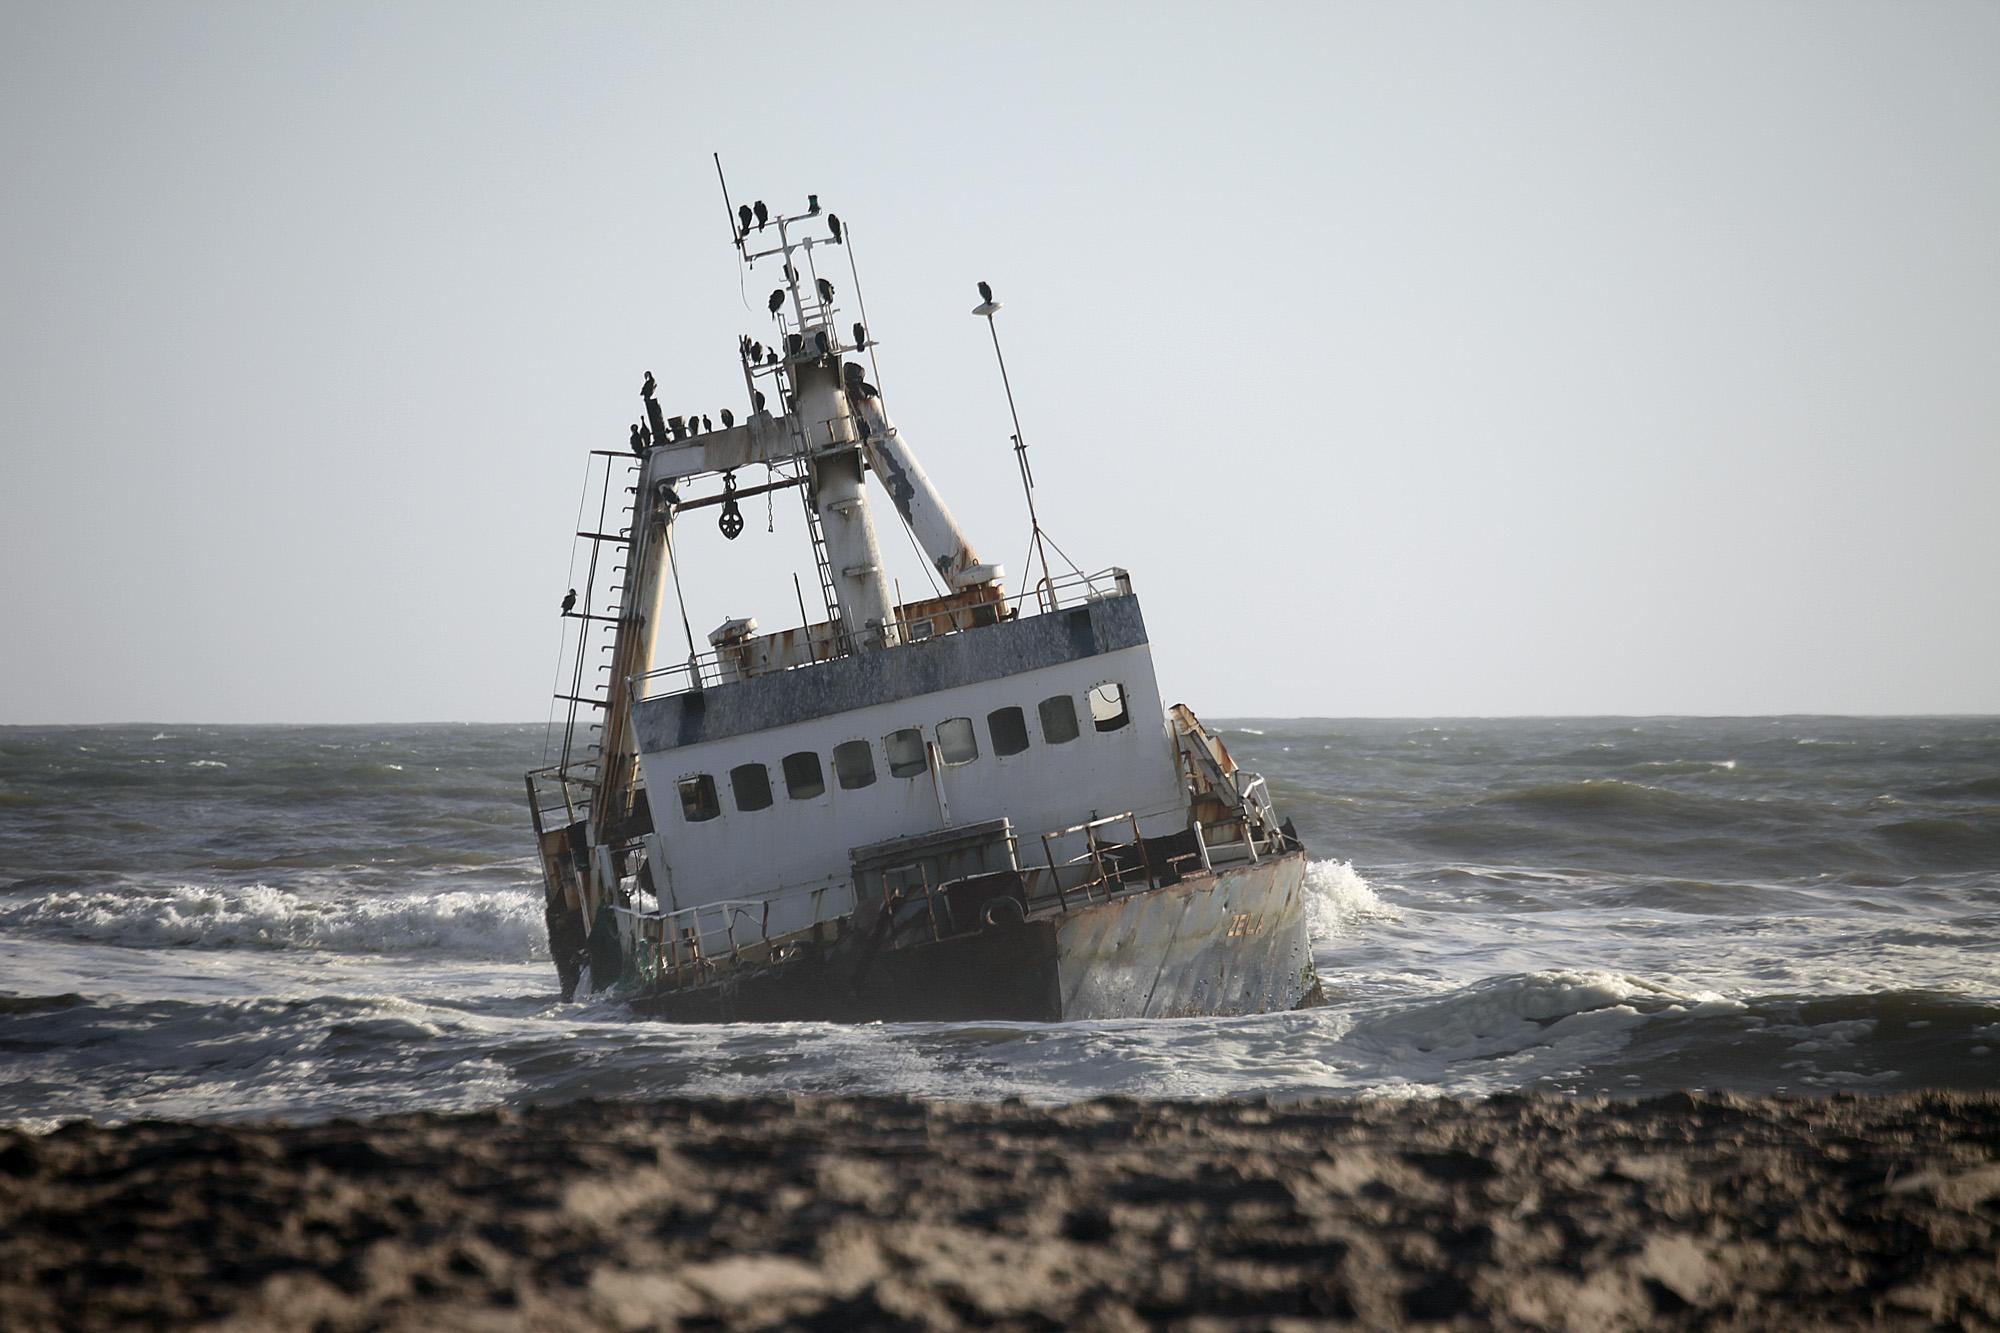 Shipwreck on the Skeleton Coast